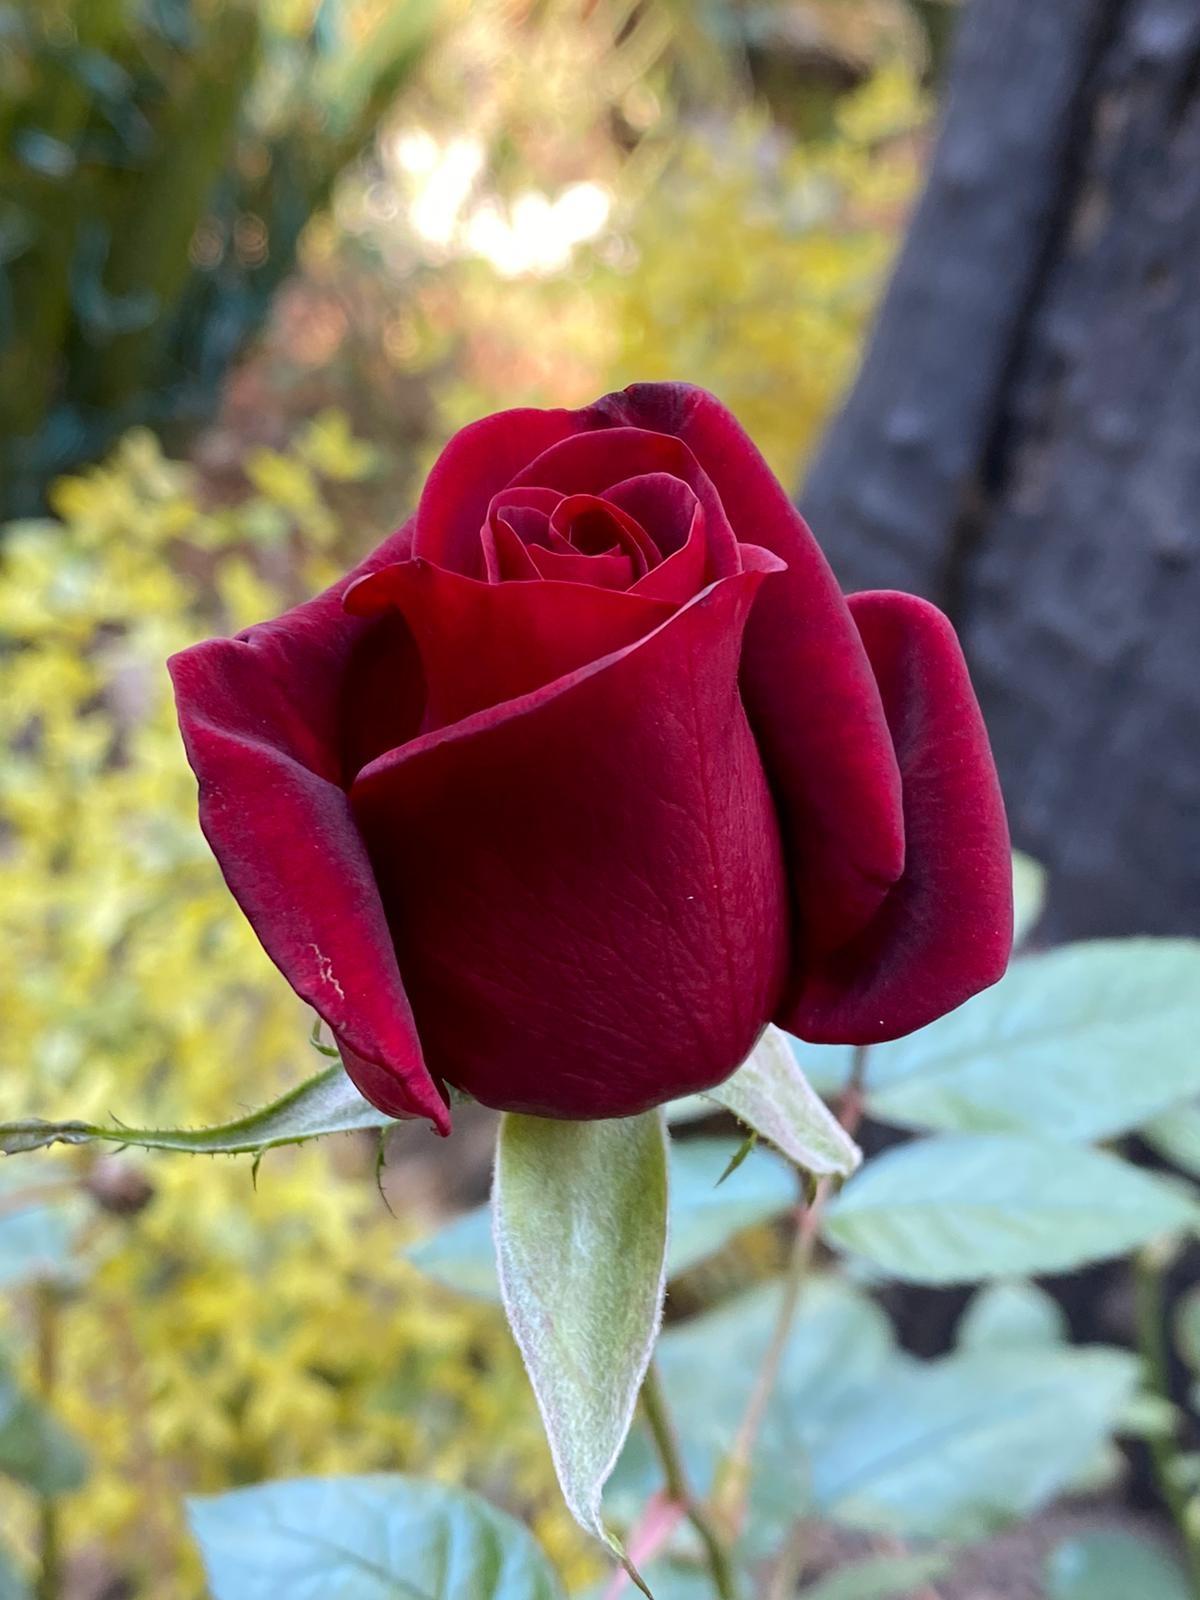 rosal Por Luis Fernando Heras Portillo